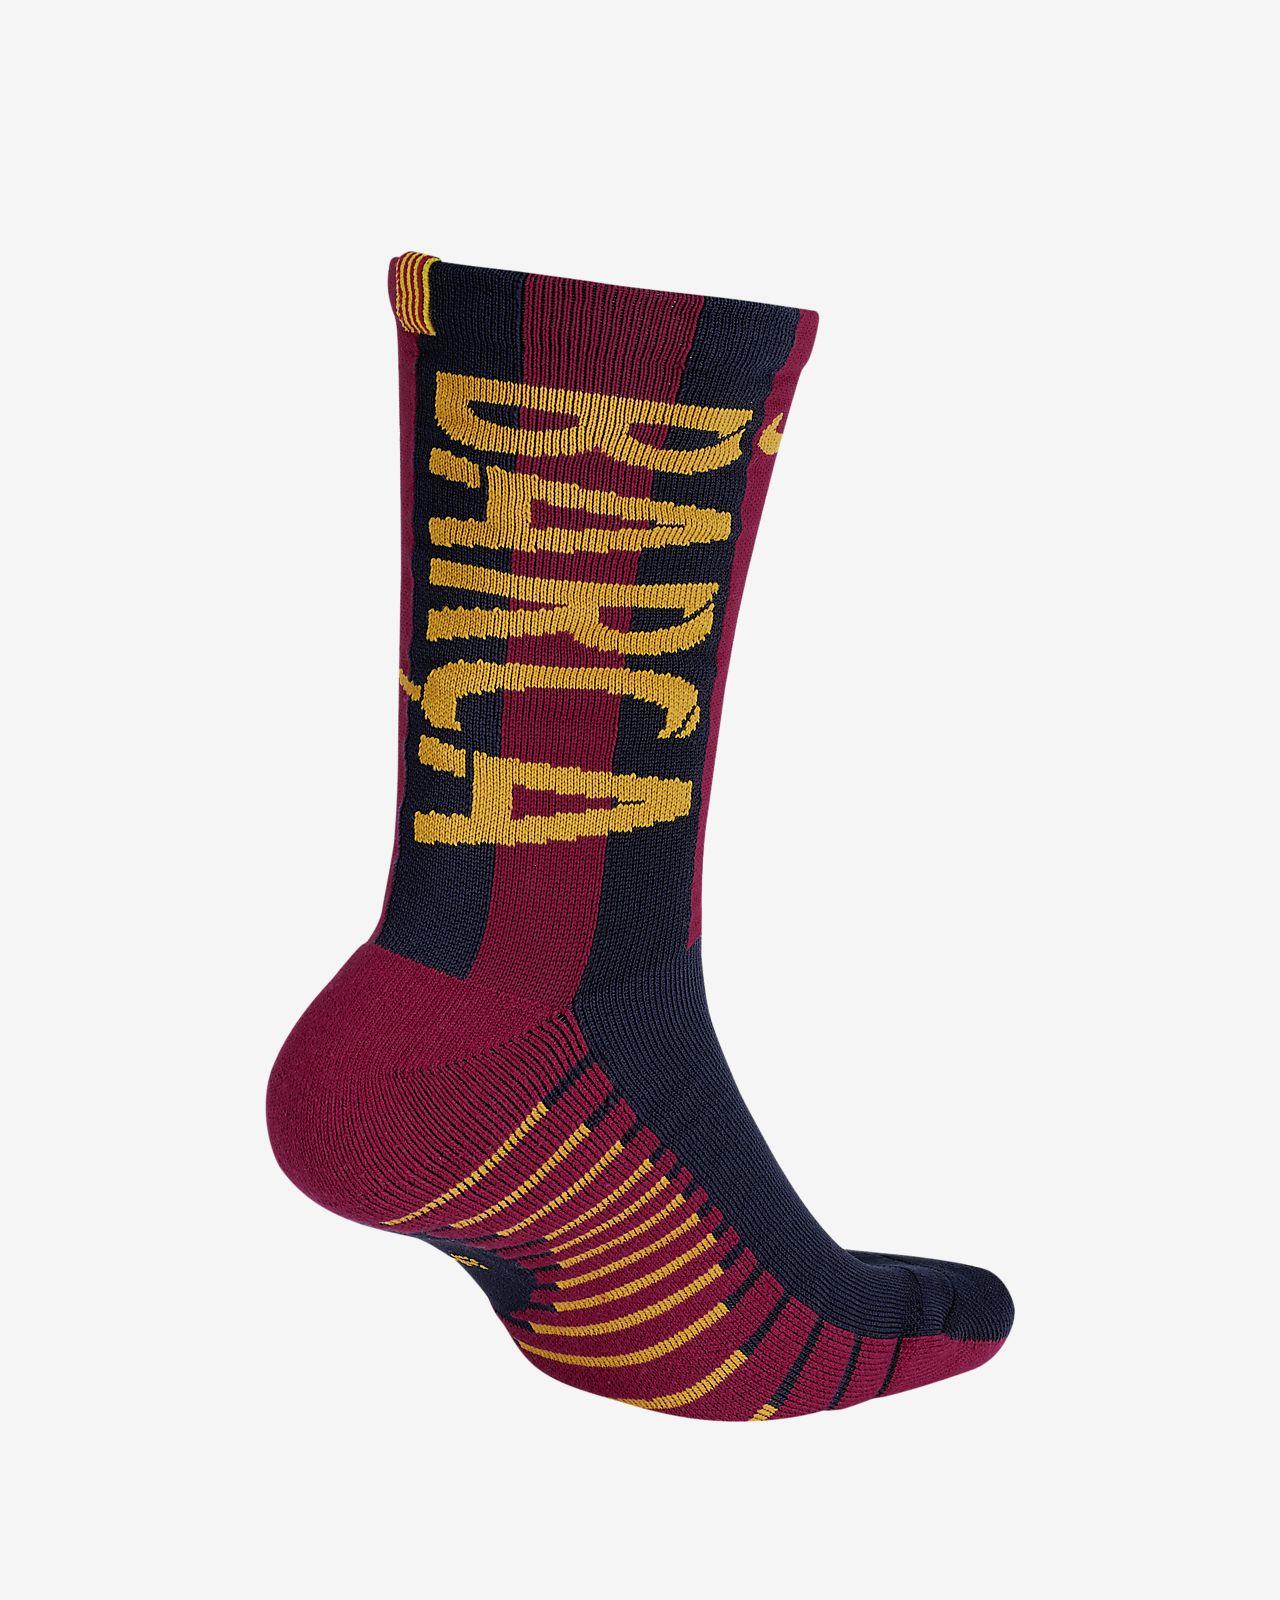 2018/19 FC Barcelona Crew Football Socks